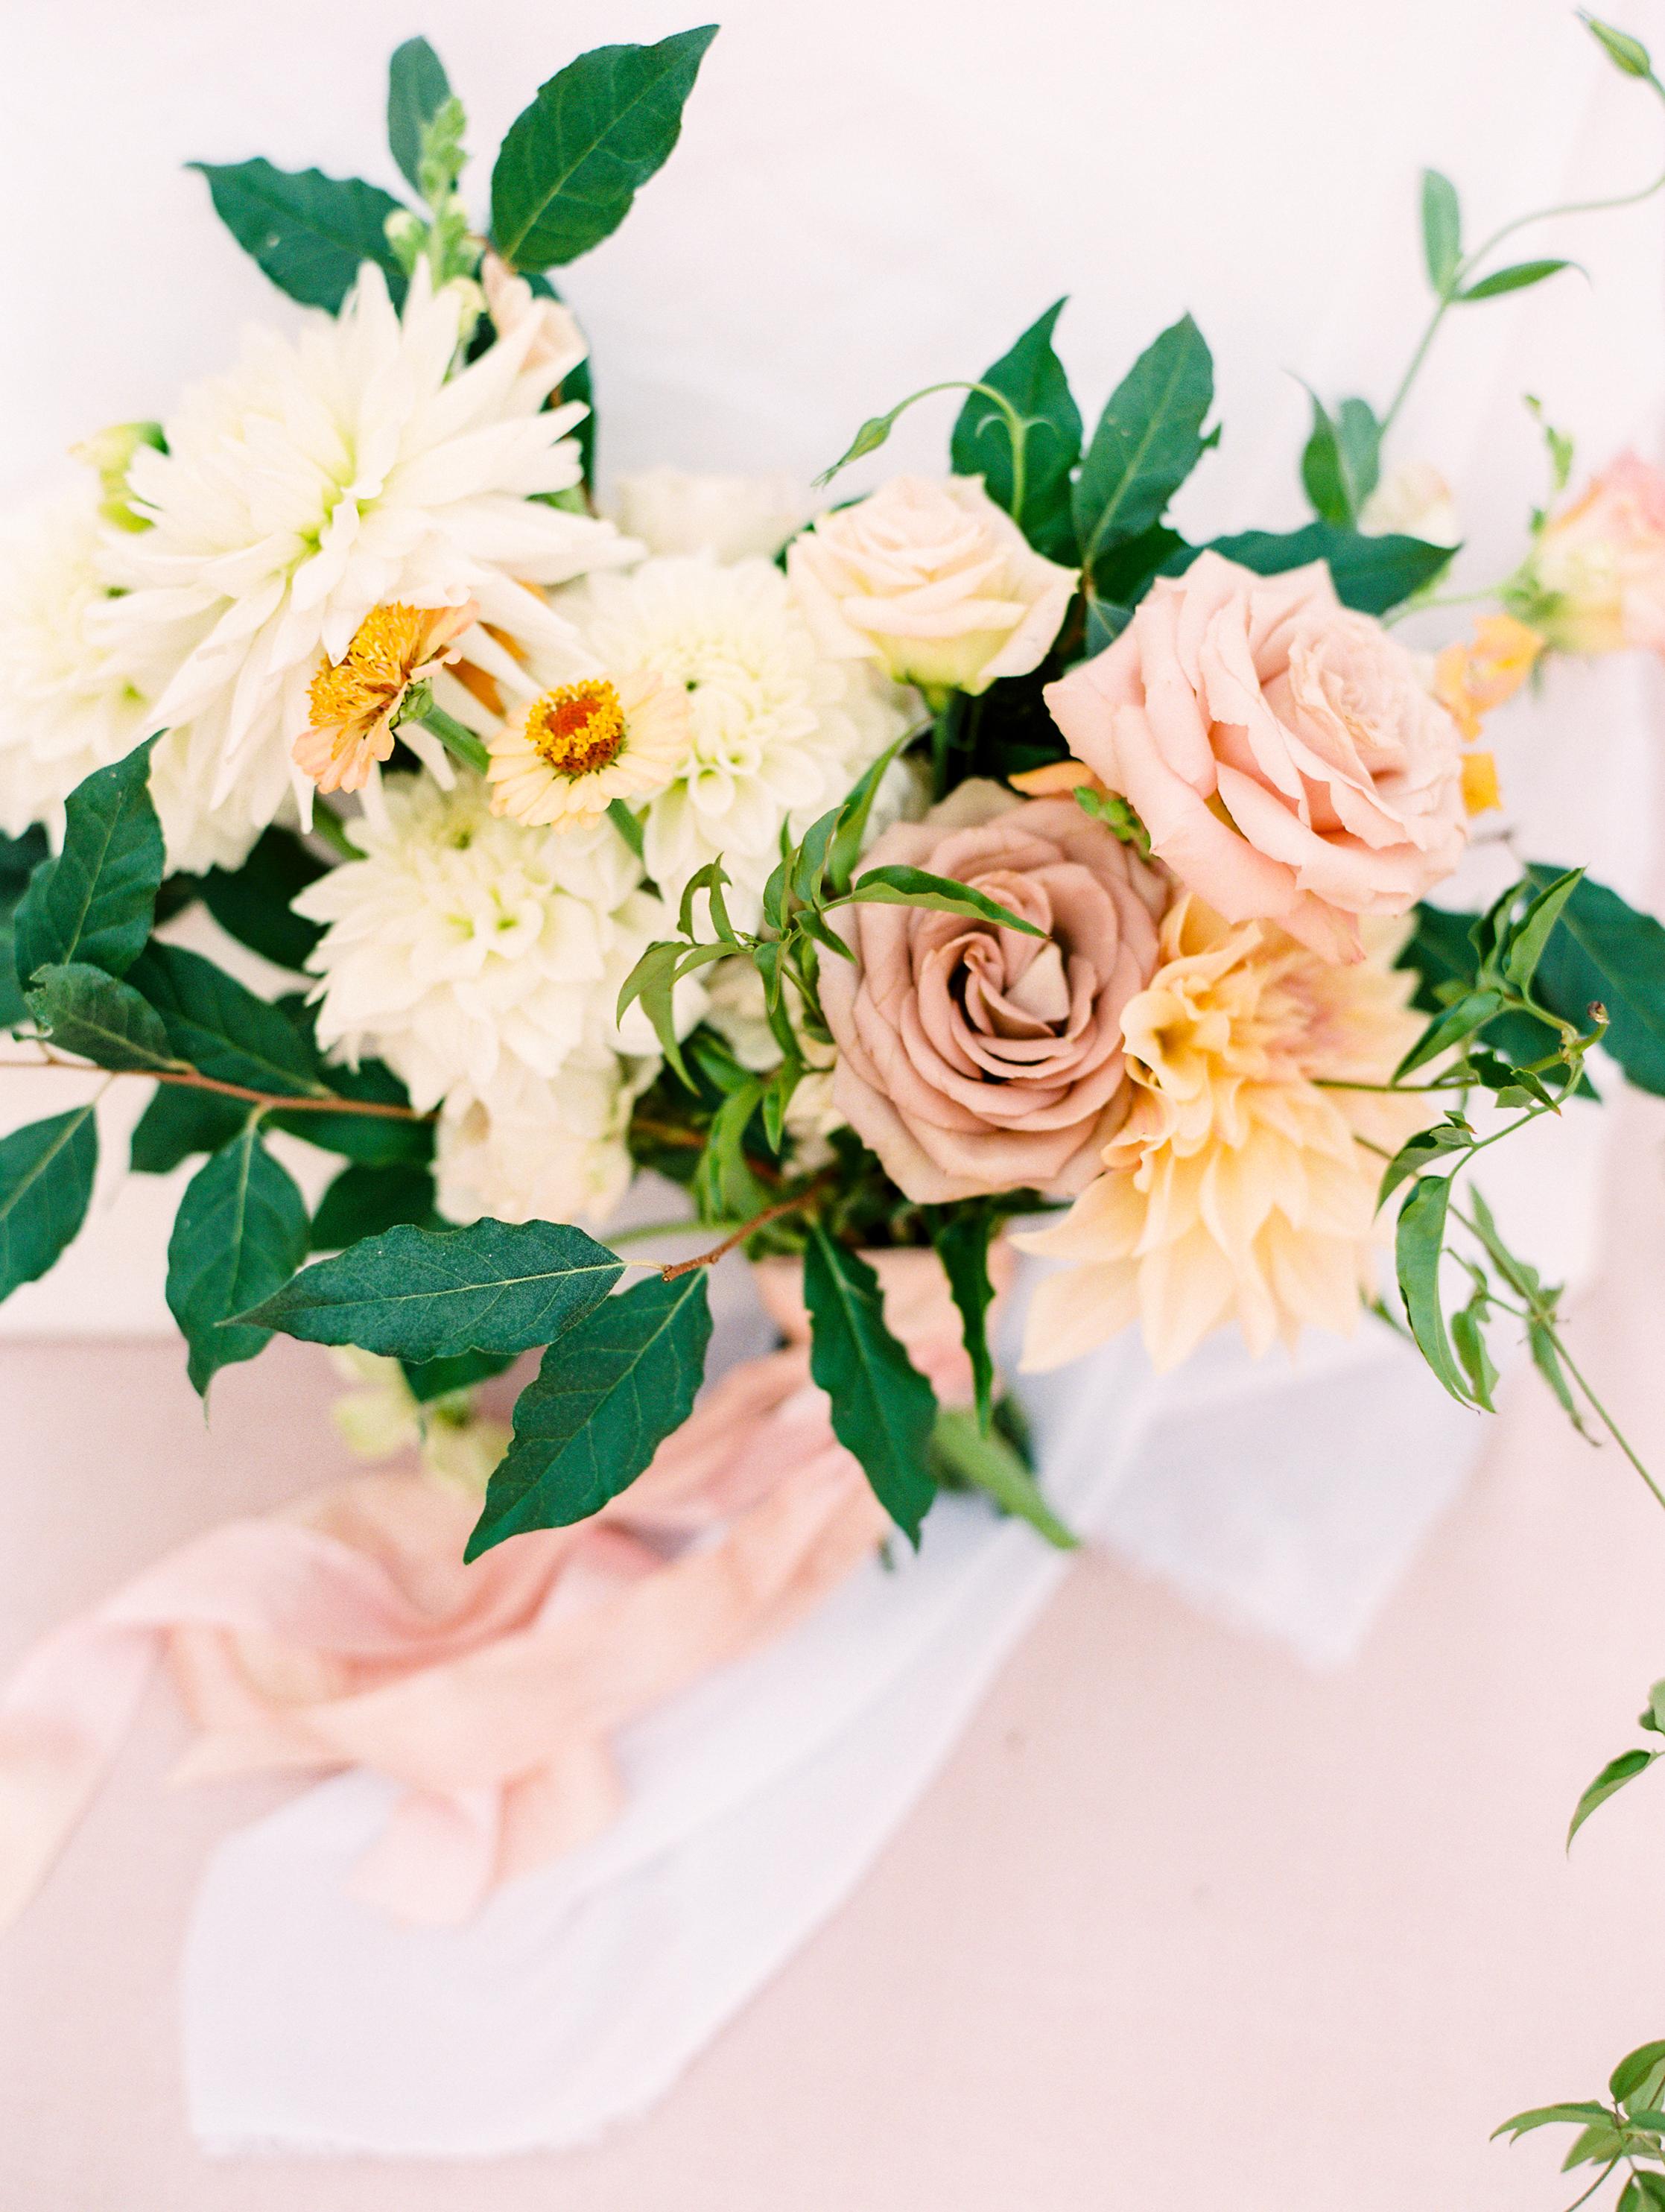 Zoller+Wedding+Details-26.jpg